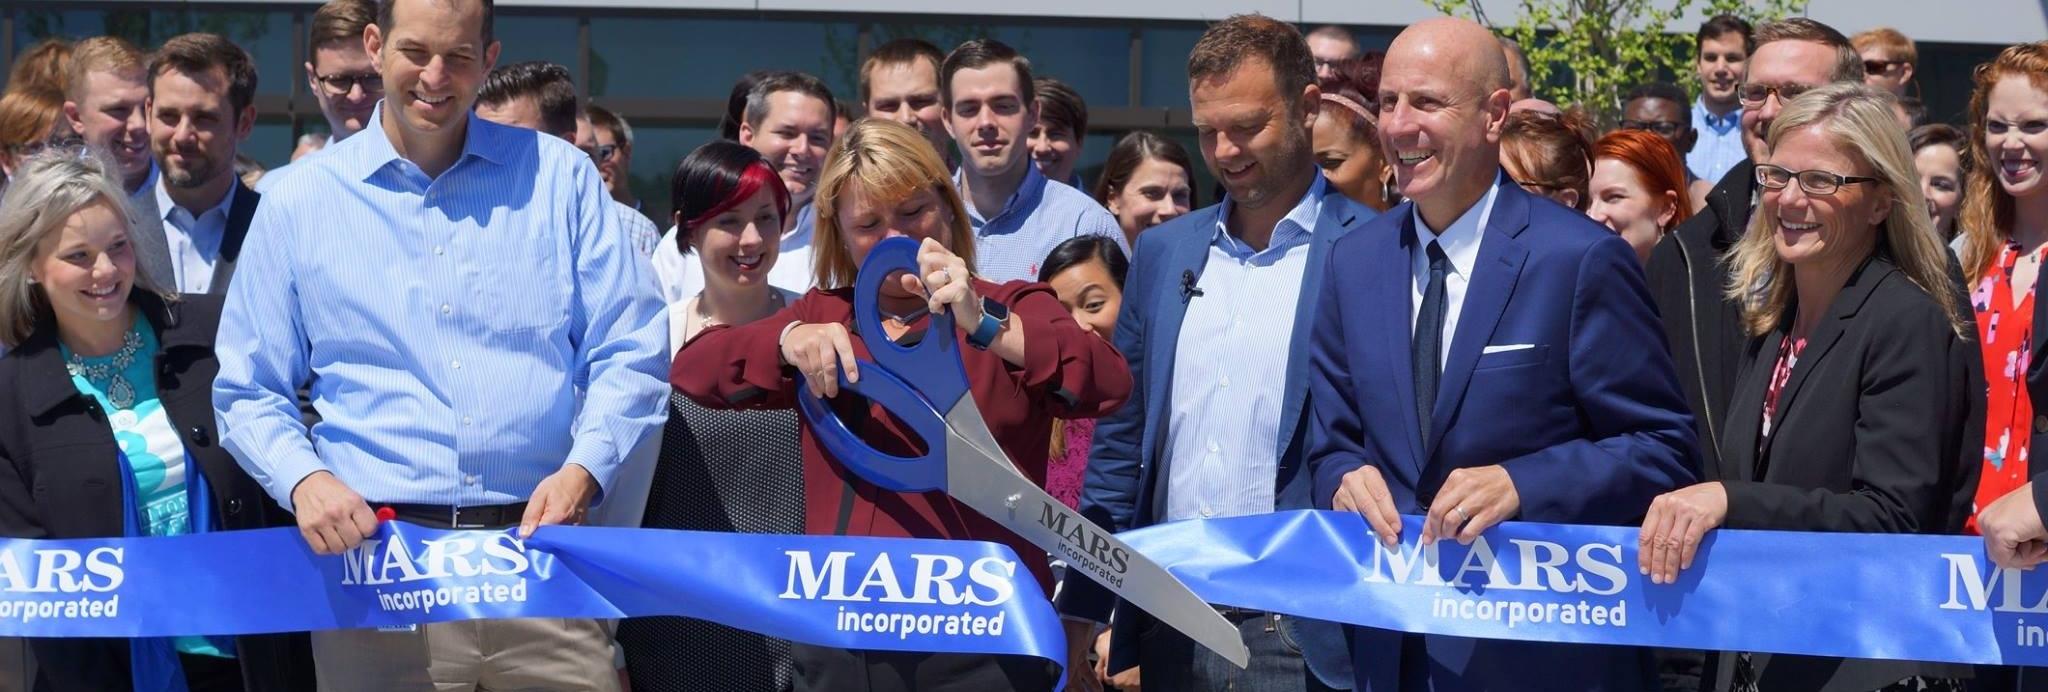 MARS Inc. Grand Opening Captured in 2017.